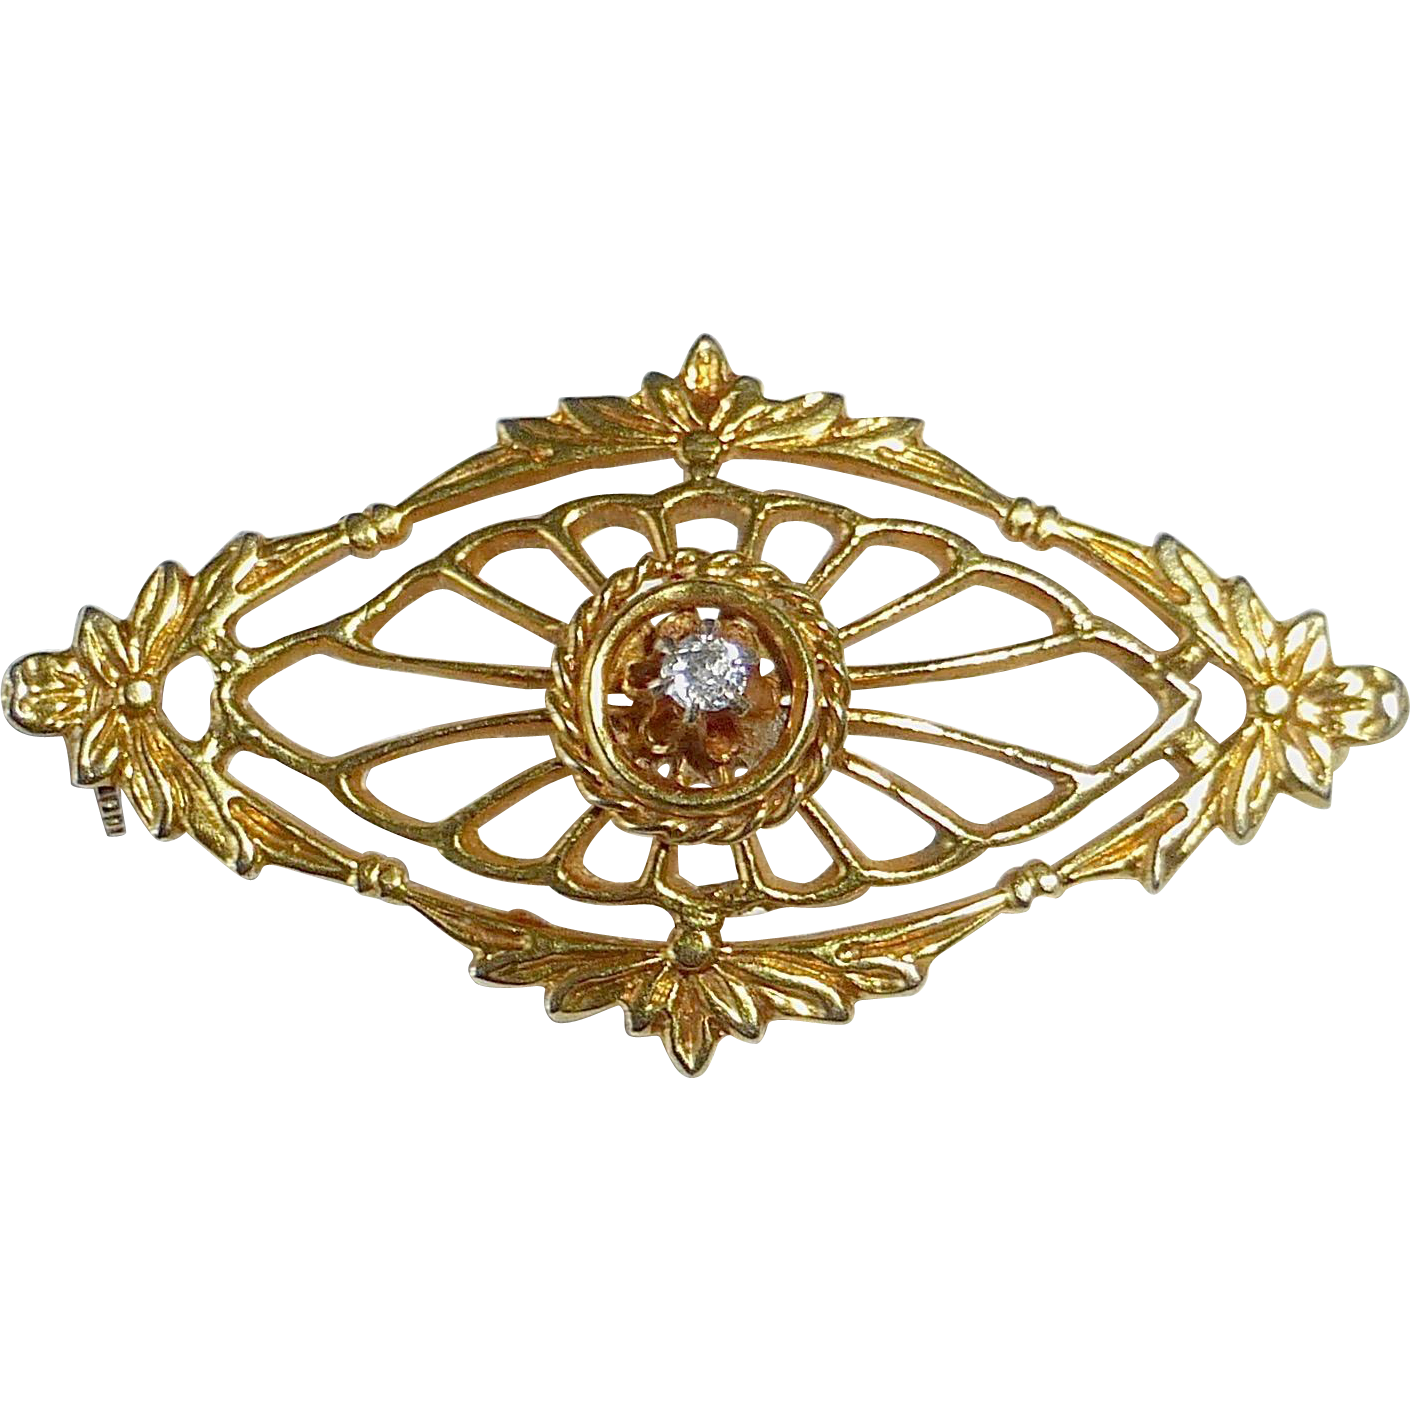 Antique 10k Yellow Gold Filigree Lace Pin w Mine Cut Diamond